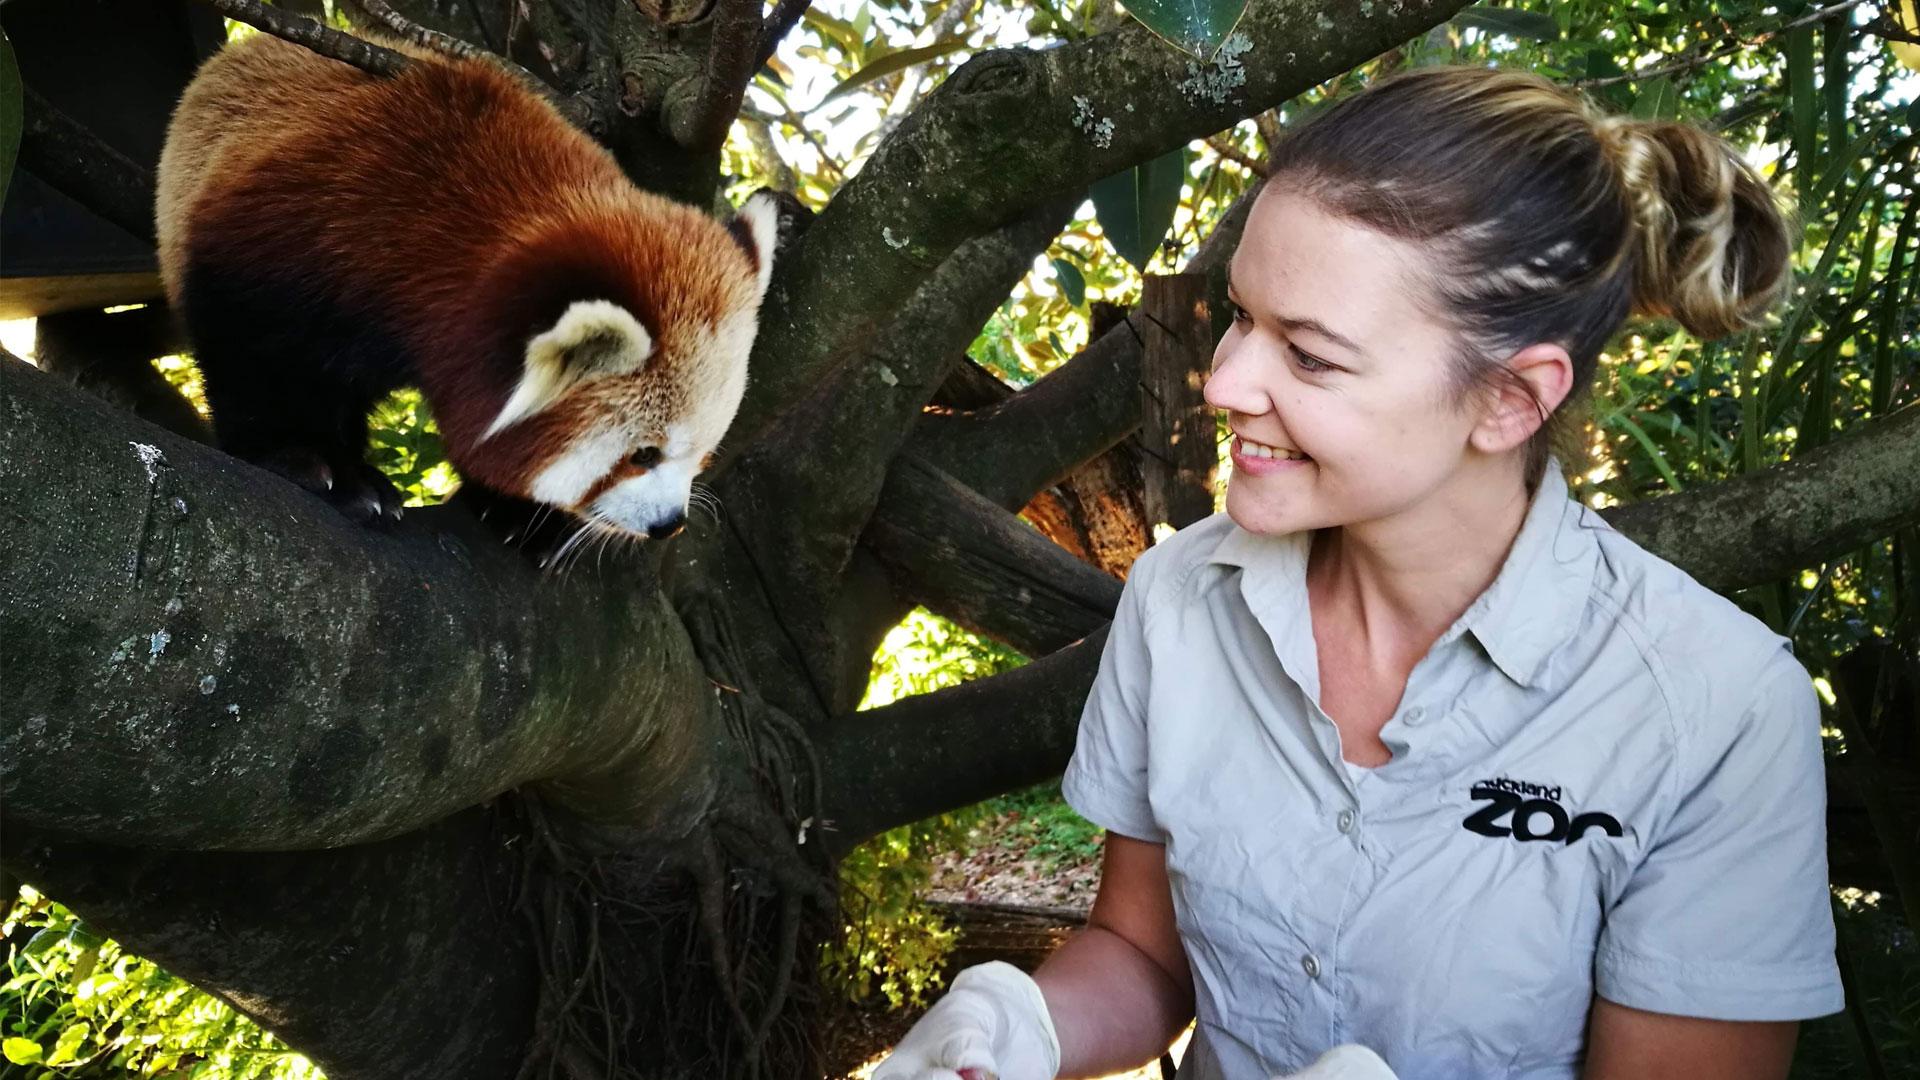 https://rfacdn.nz/zoo/assets/media/vet-nurse-awareness-week-gallery-6.jpg